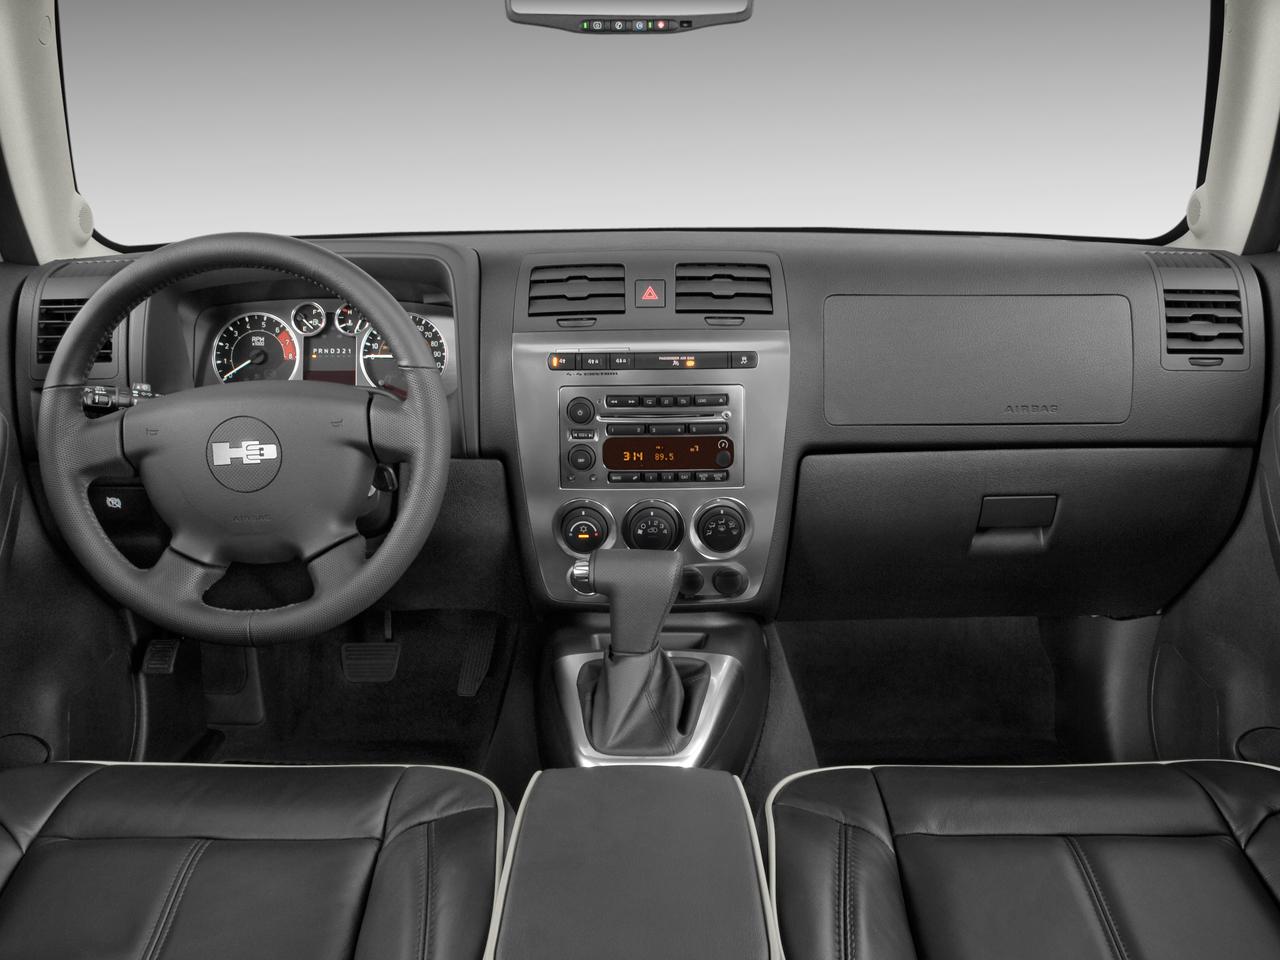 Hummer h3t related imagesstart 250 weili automotive network hummer h3t alphareviews vanachro Gallery